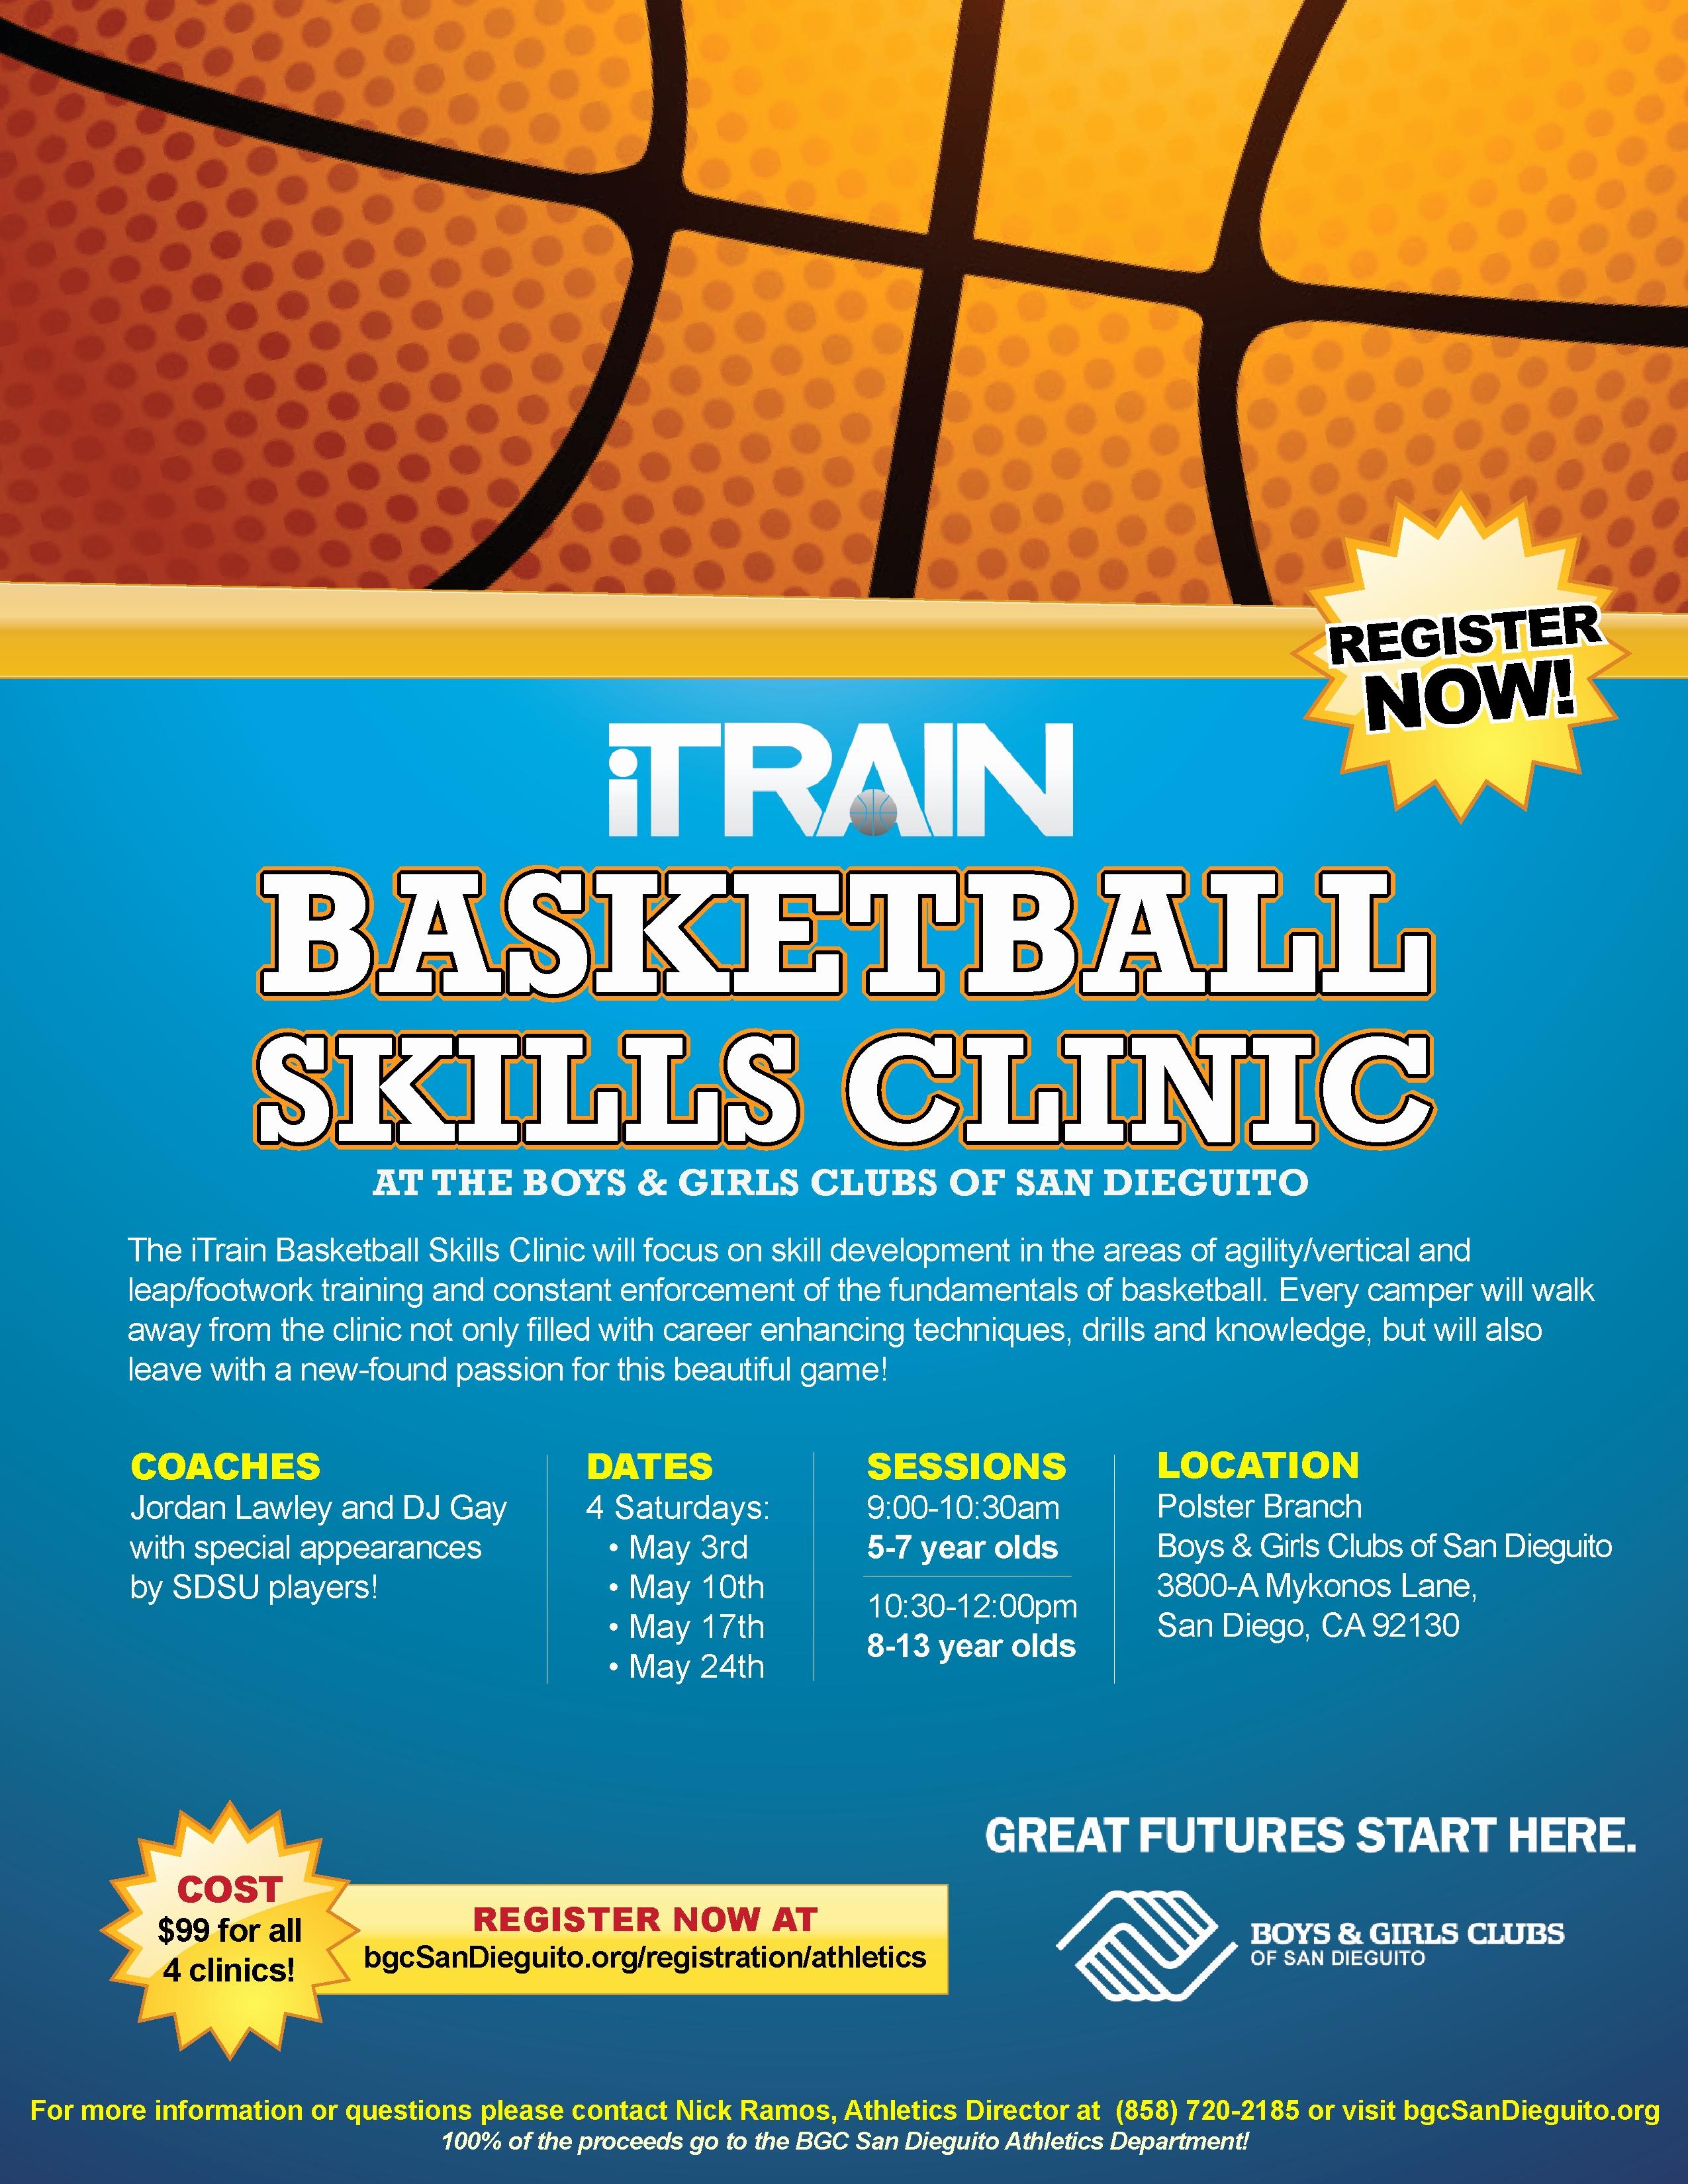 Camp Flyer Template Microsoft Word Elegant Basketball Camp Flyer Regarding Basketball Camp Brochure Template